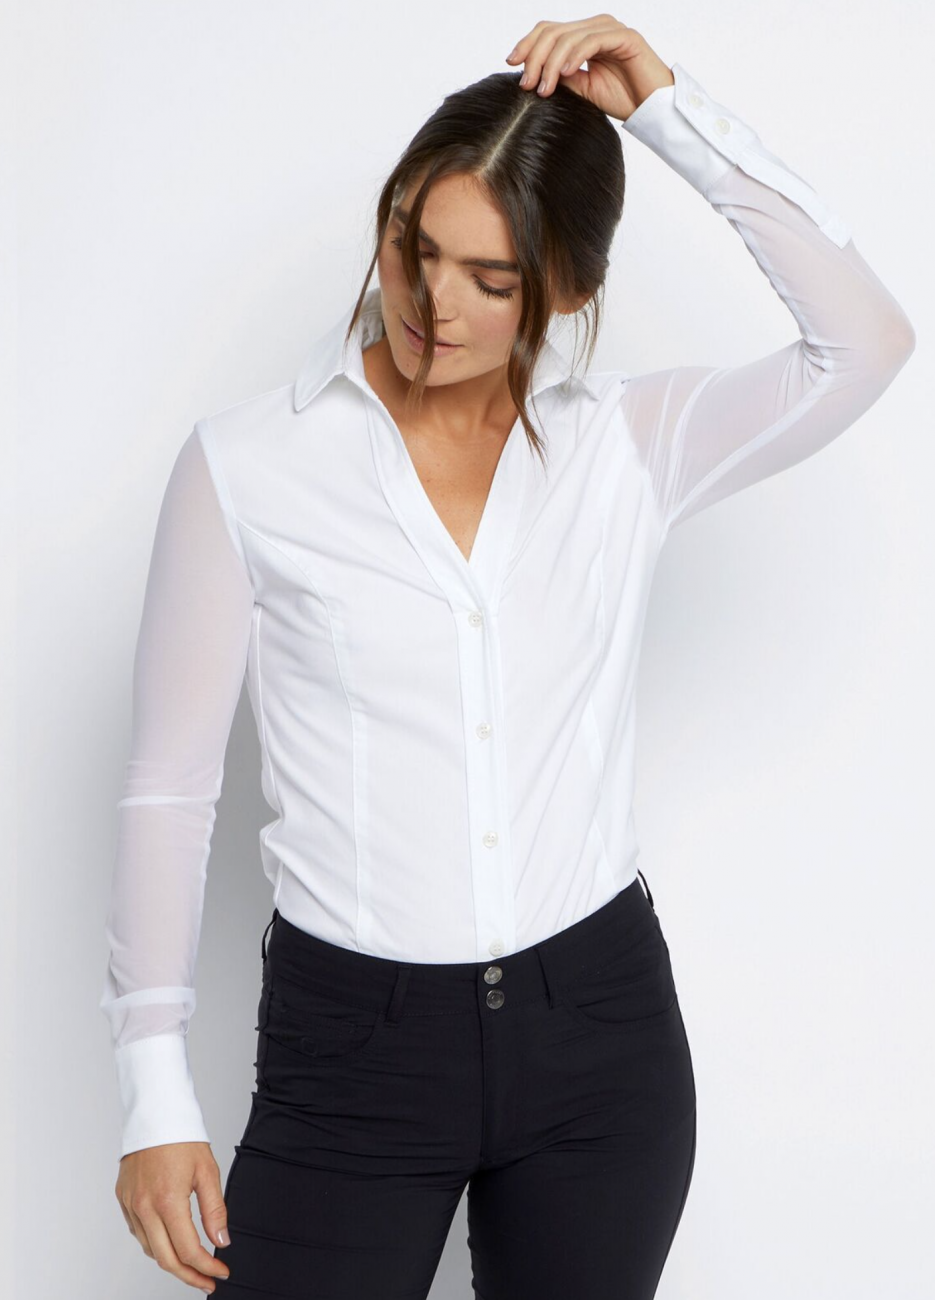 Anatomie White Woven/Mesh Button Down Collared Shirt